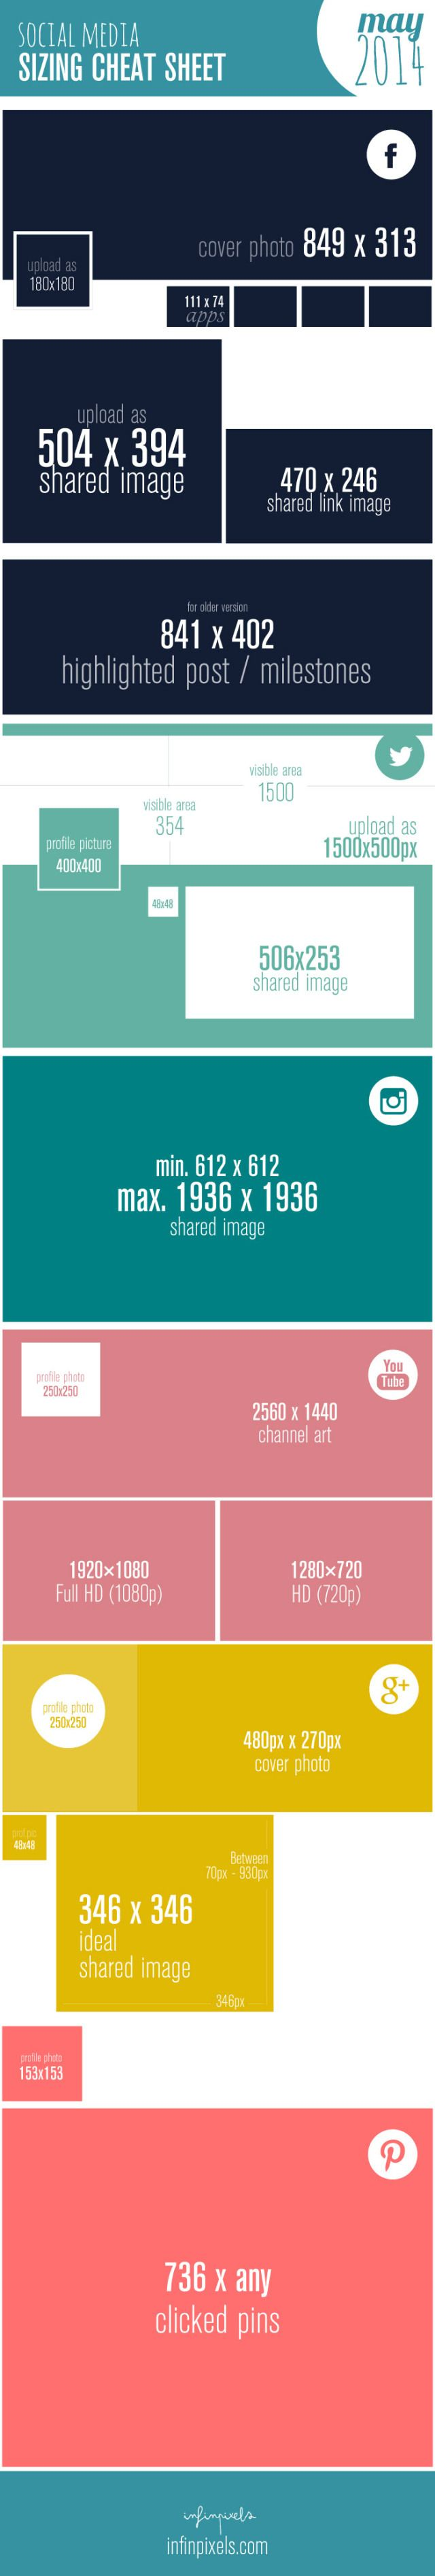 Social Media sizing cheat sheet #infografia #infographic #socialmedia